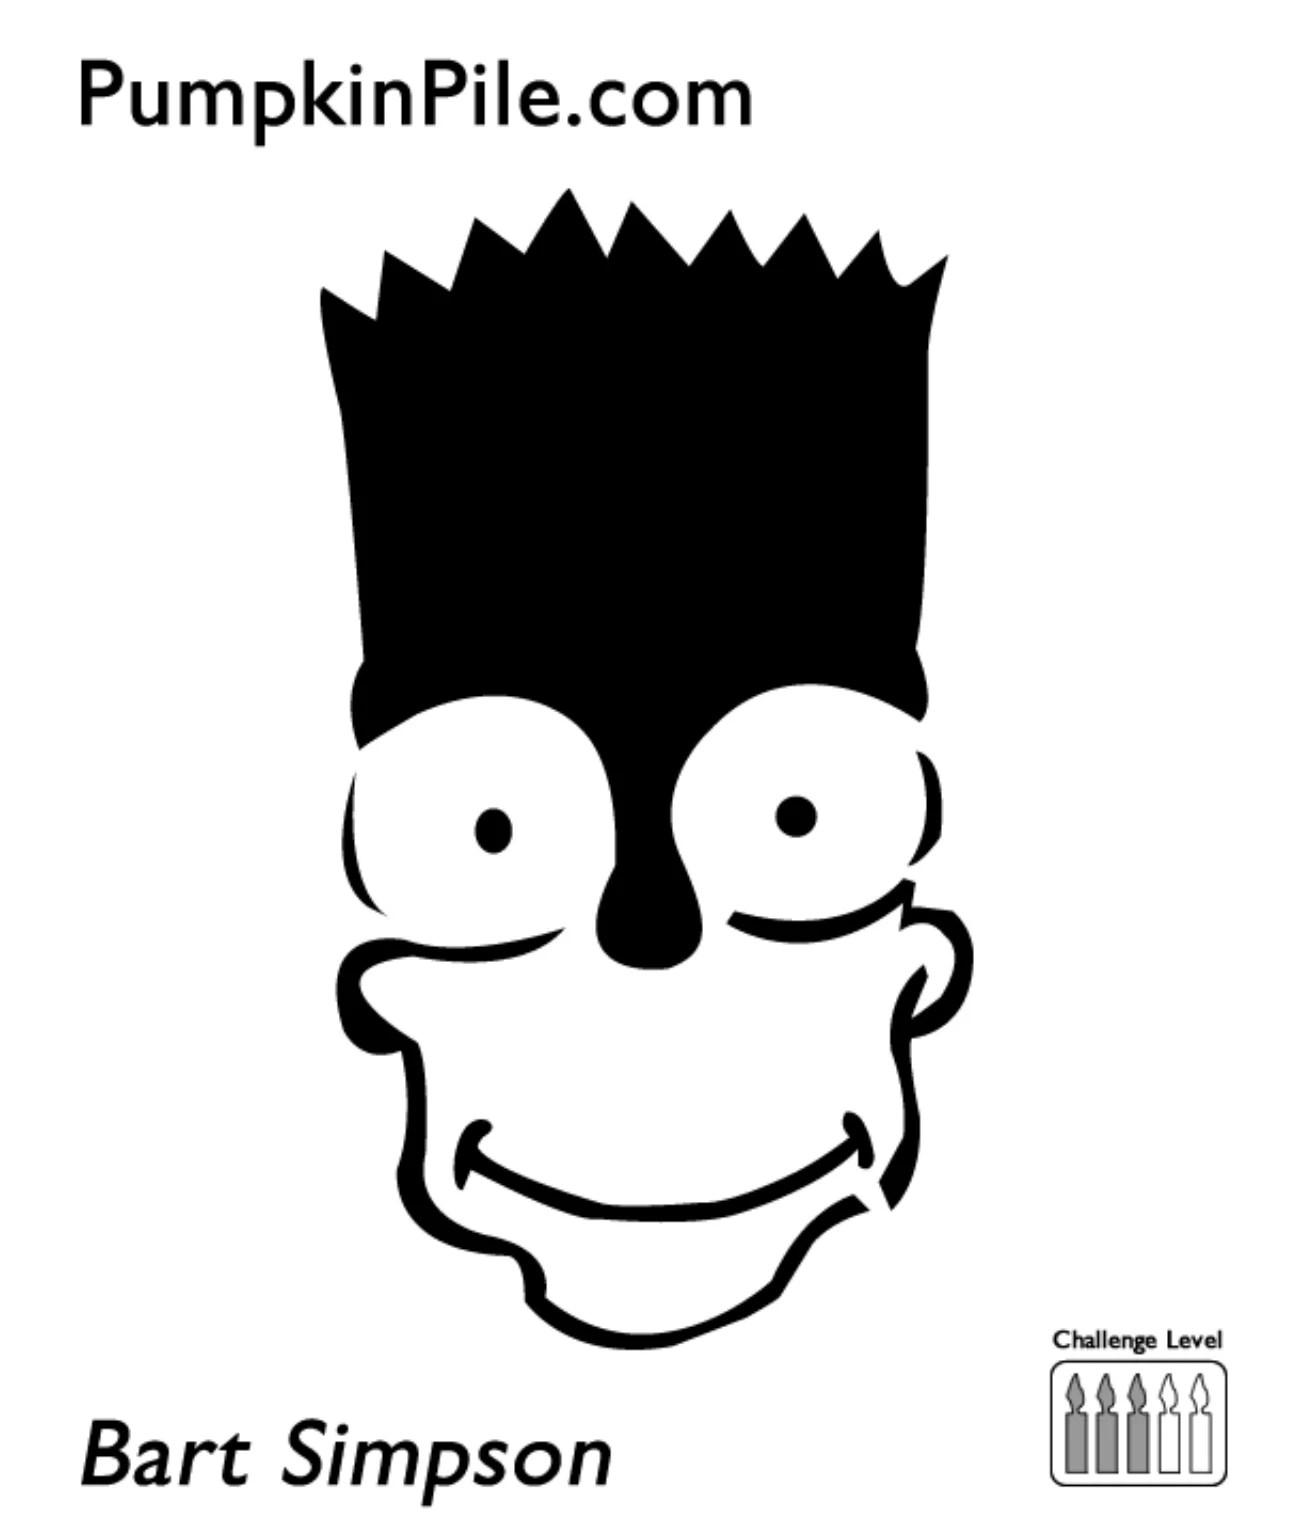 Smiley Face Pumpkin Stencil